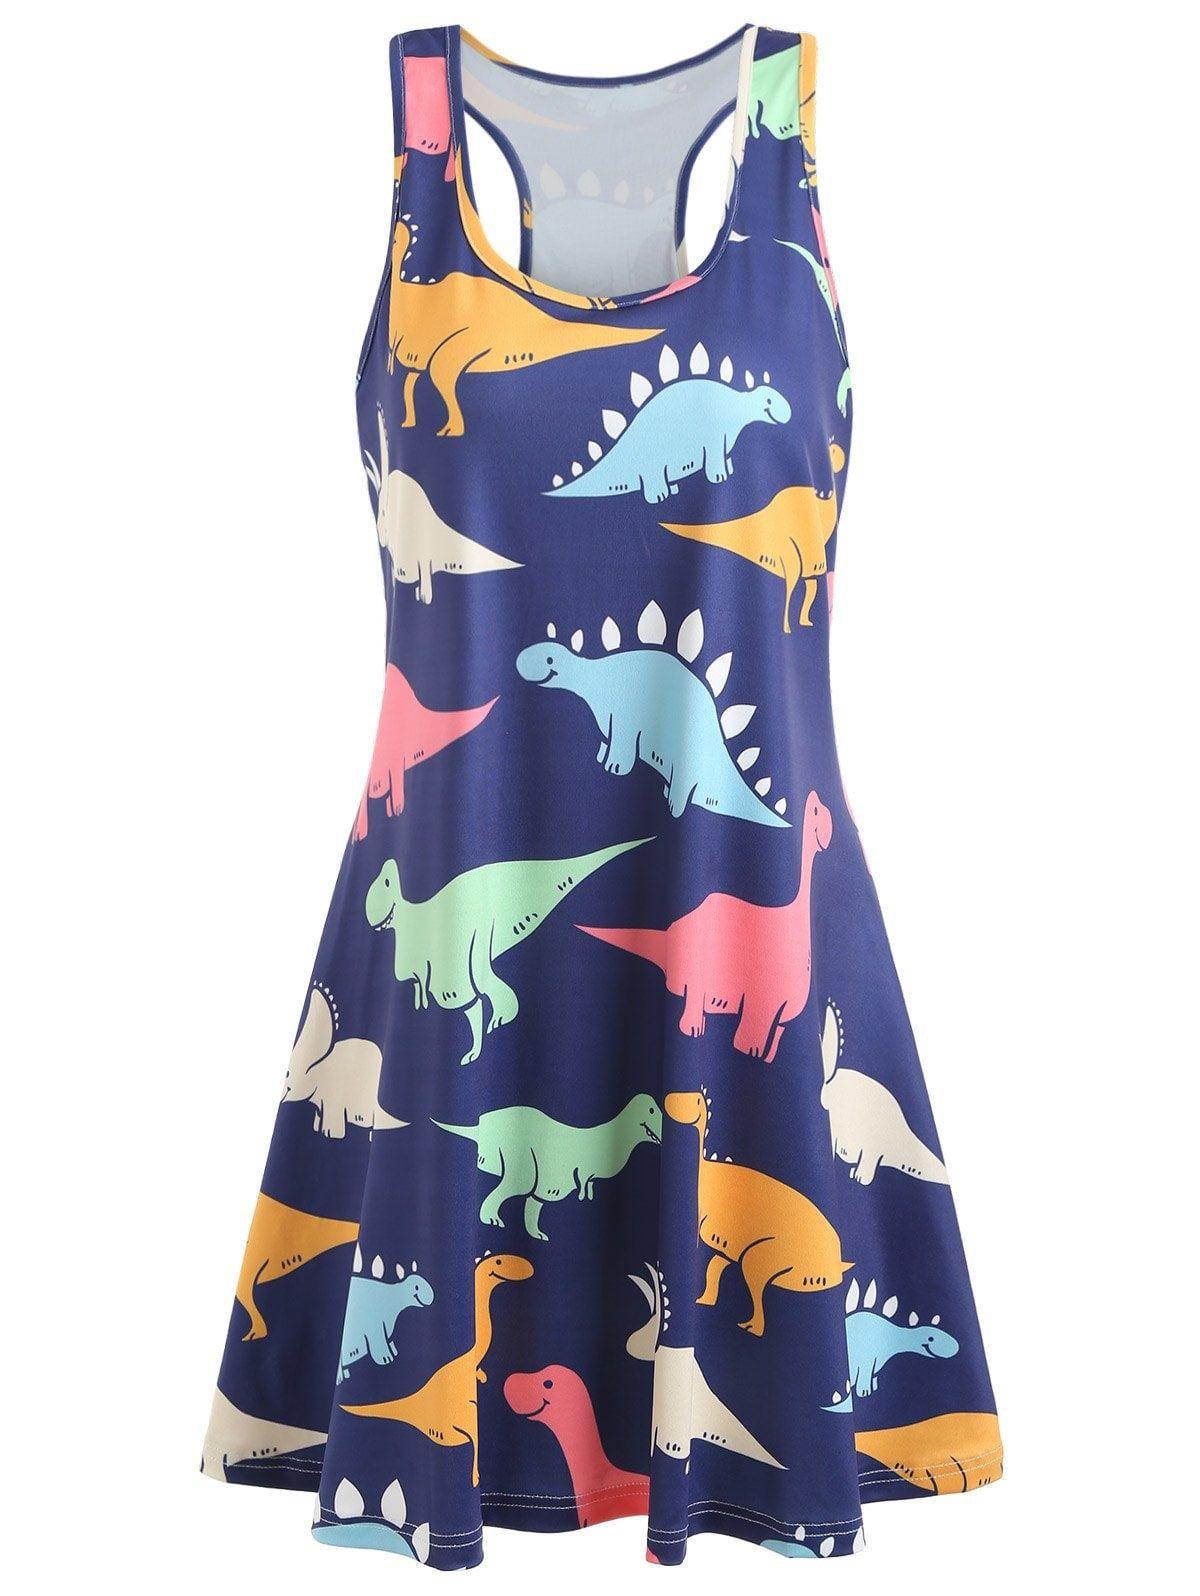 Dinosaur Swing Tank Dress Racerback Tank Dress Cheap Dresses Casual Casual Dresses [ 1596 x 1200 Pixel ]